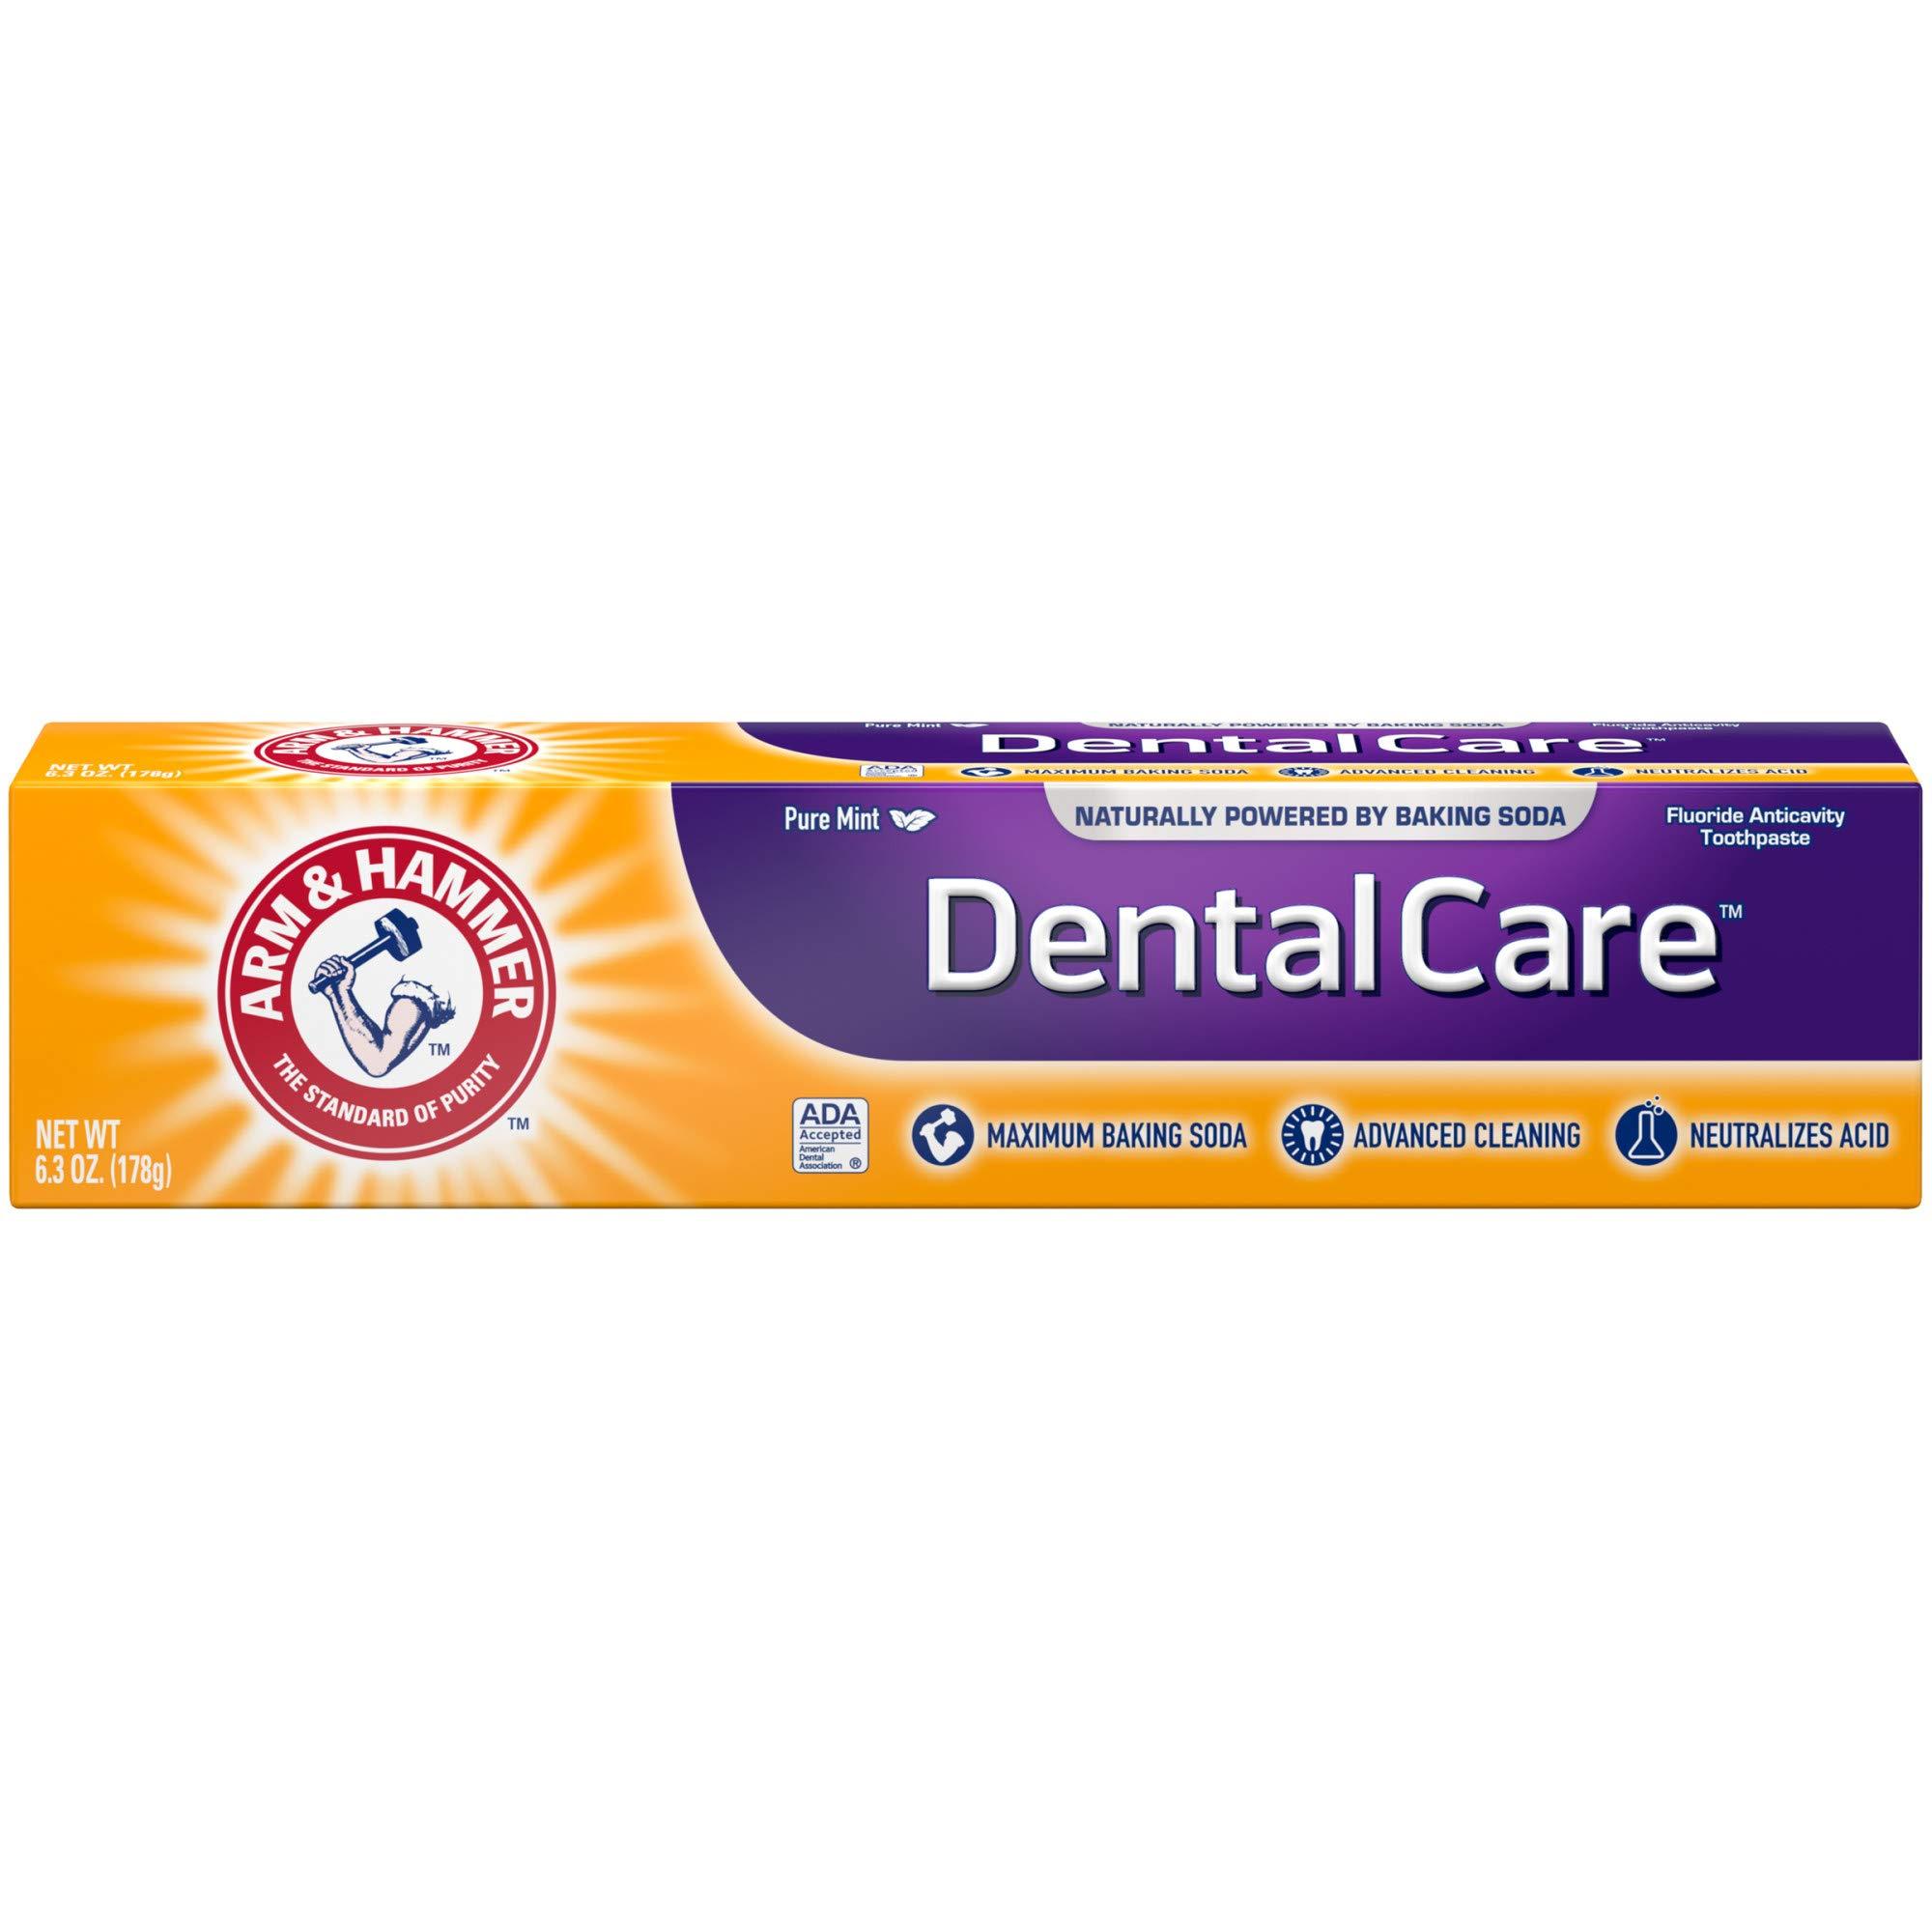 Arm & Hammer Dental Care Toothpaste 6.3 OZ